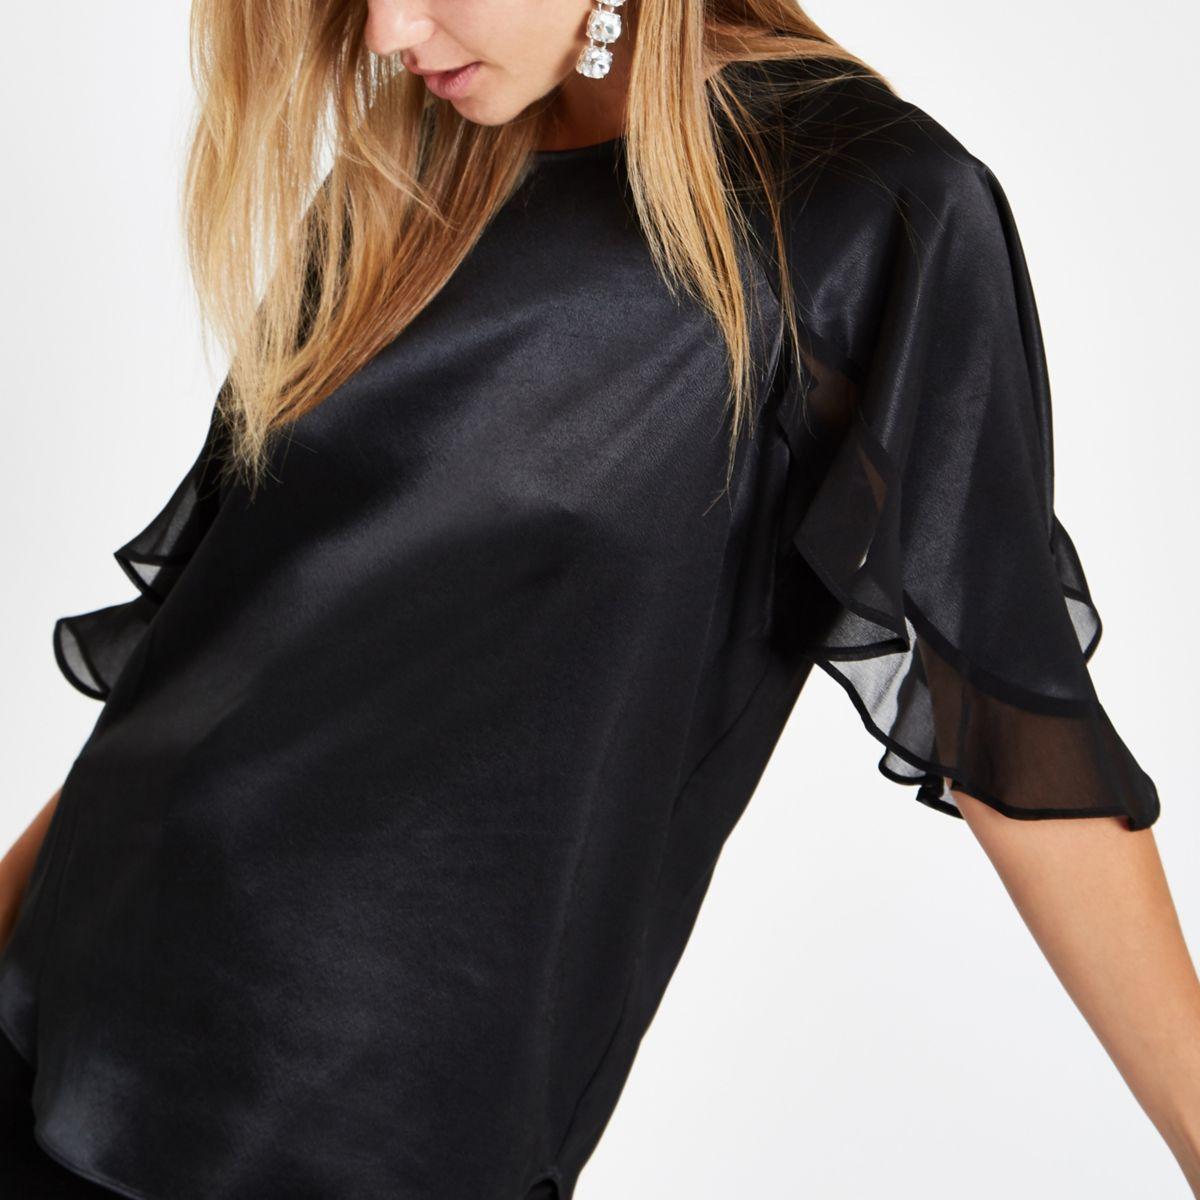 Black chiffon frill sleeve top